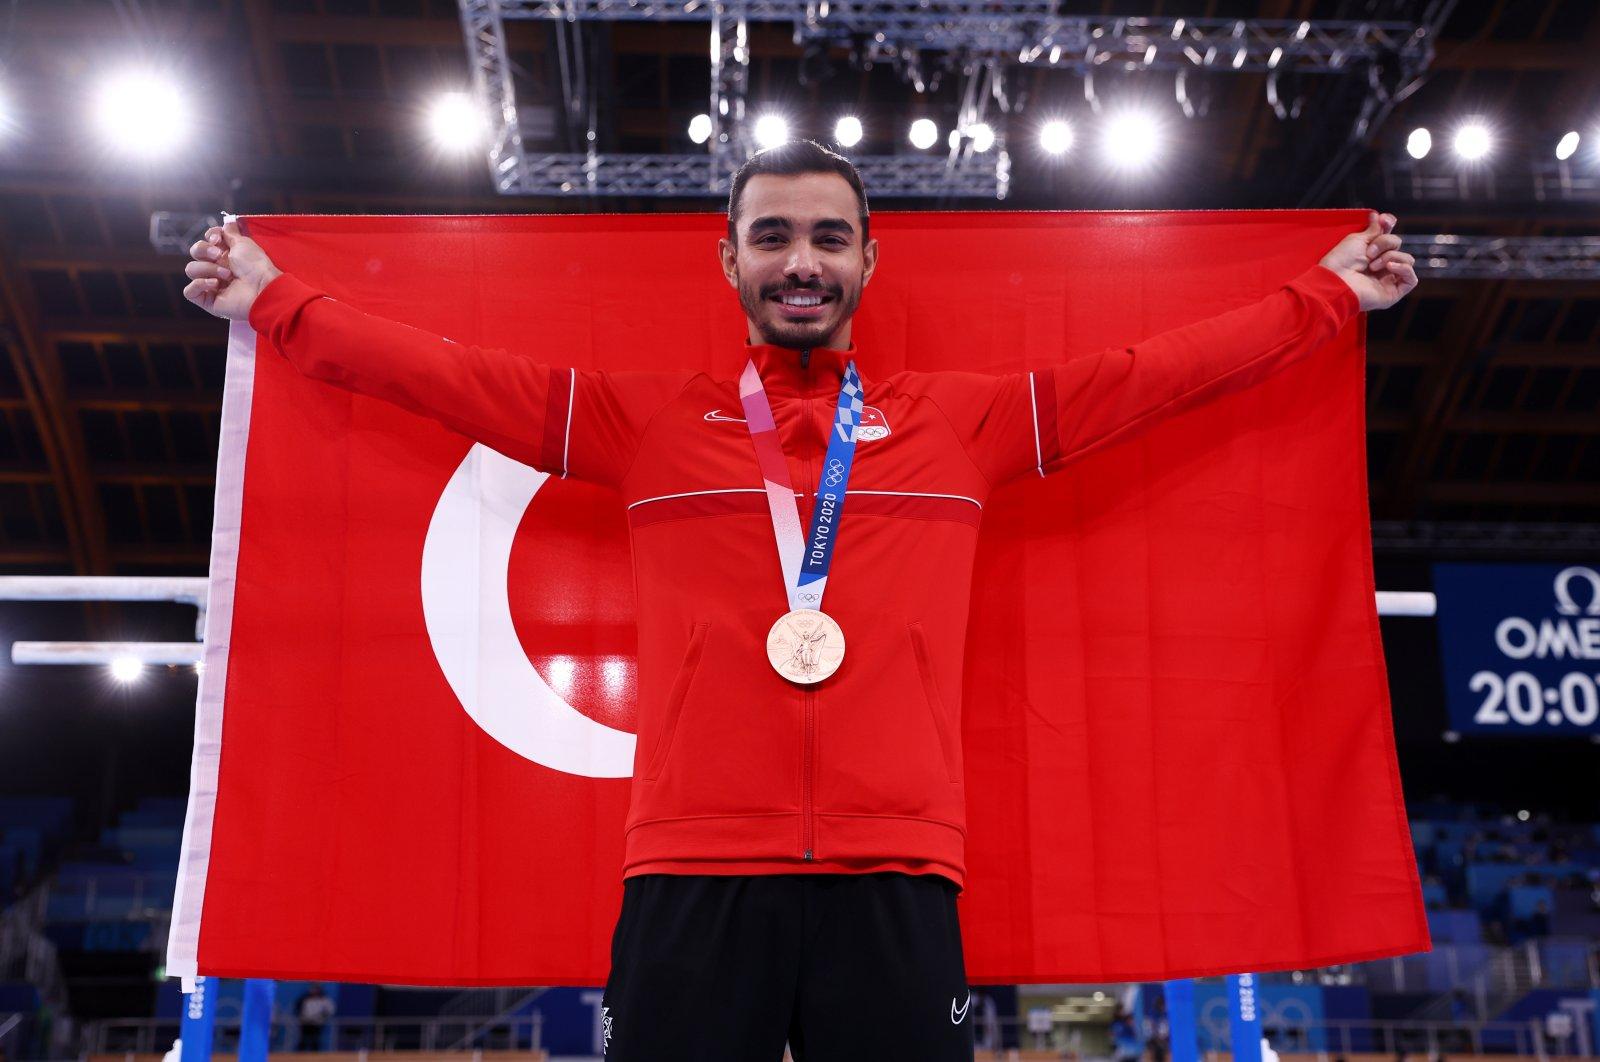 Turkey's Ferhat Arıcan celebrates winning bronze in the Tokyo 2020 Olympics men's parallel bars event at the Ariake Gymnastics Centre, Tokyo, Japan, Aug. 3, 2021. (Reuters Photo)